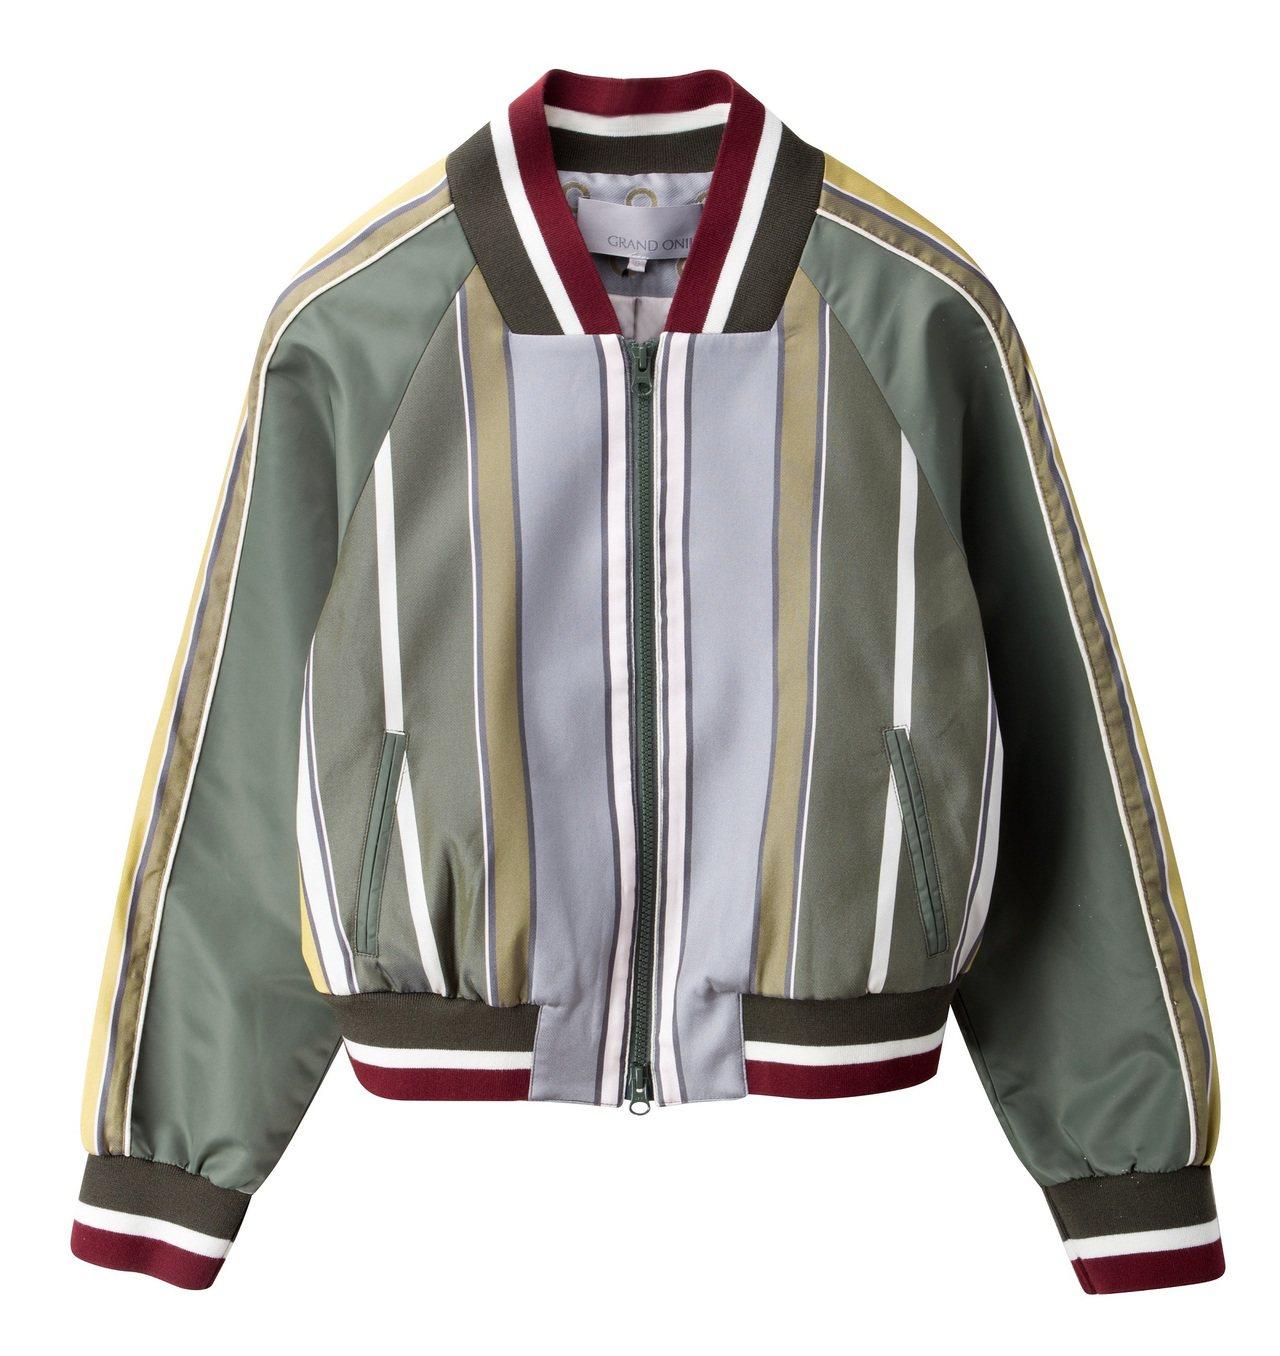 GRAND ONIL潮流時尚短版外套,原價11,900元,特價2,800元(公館...